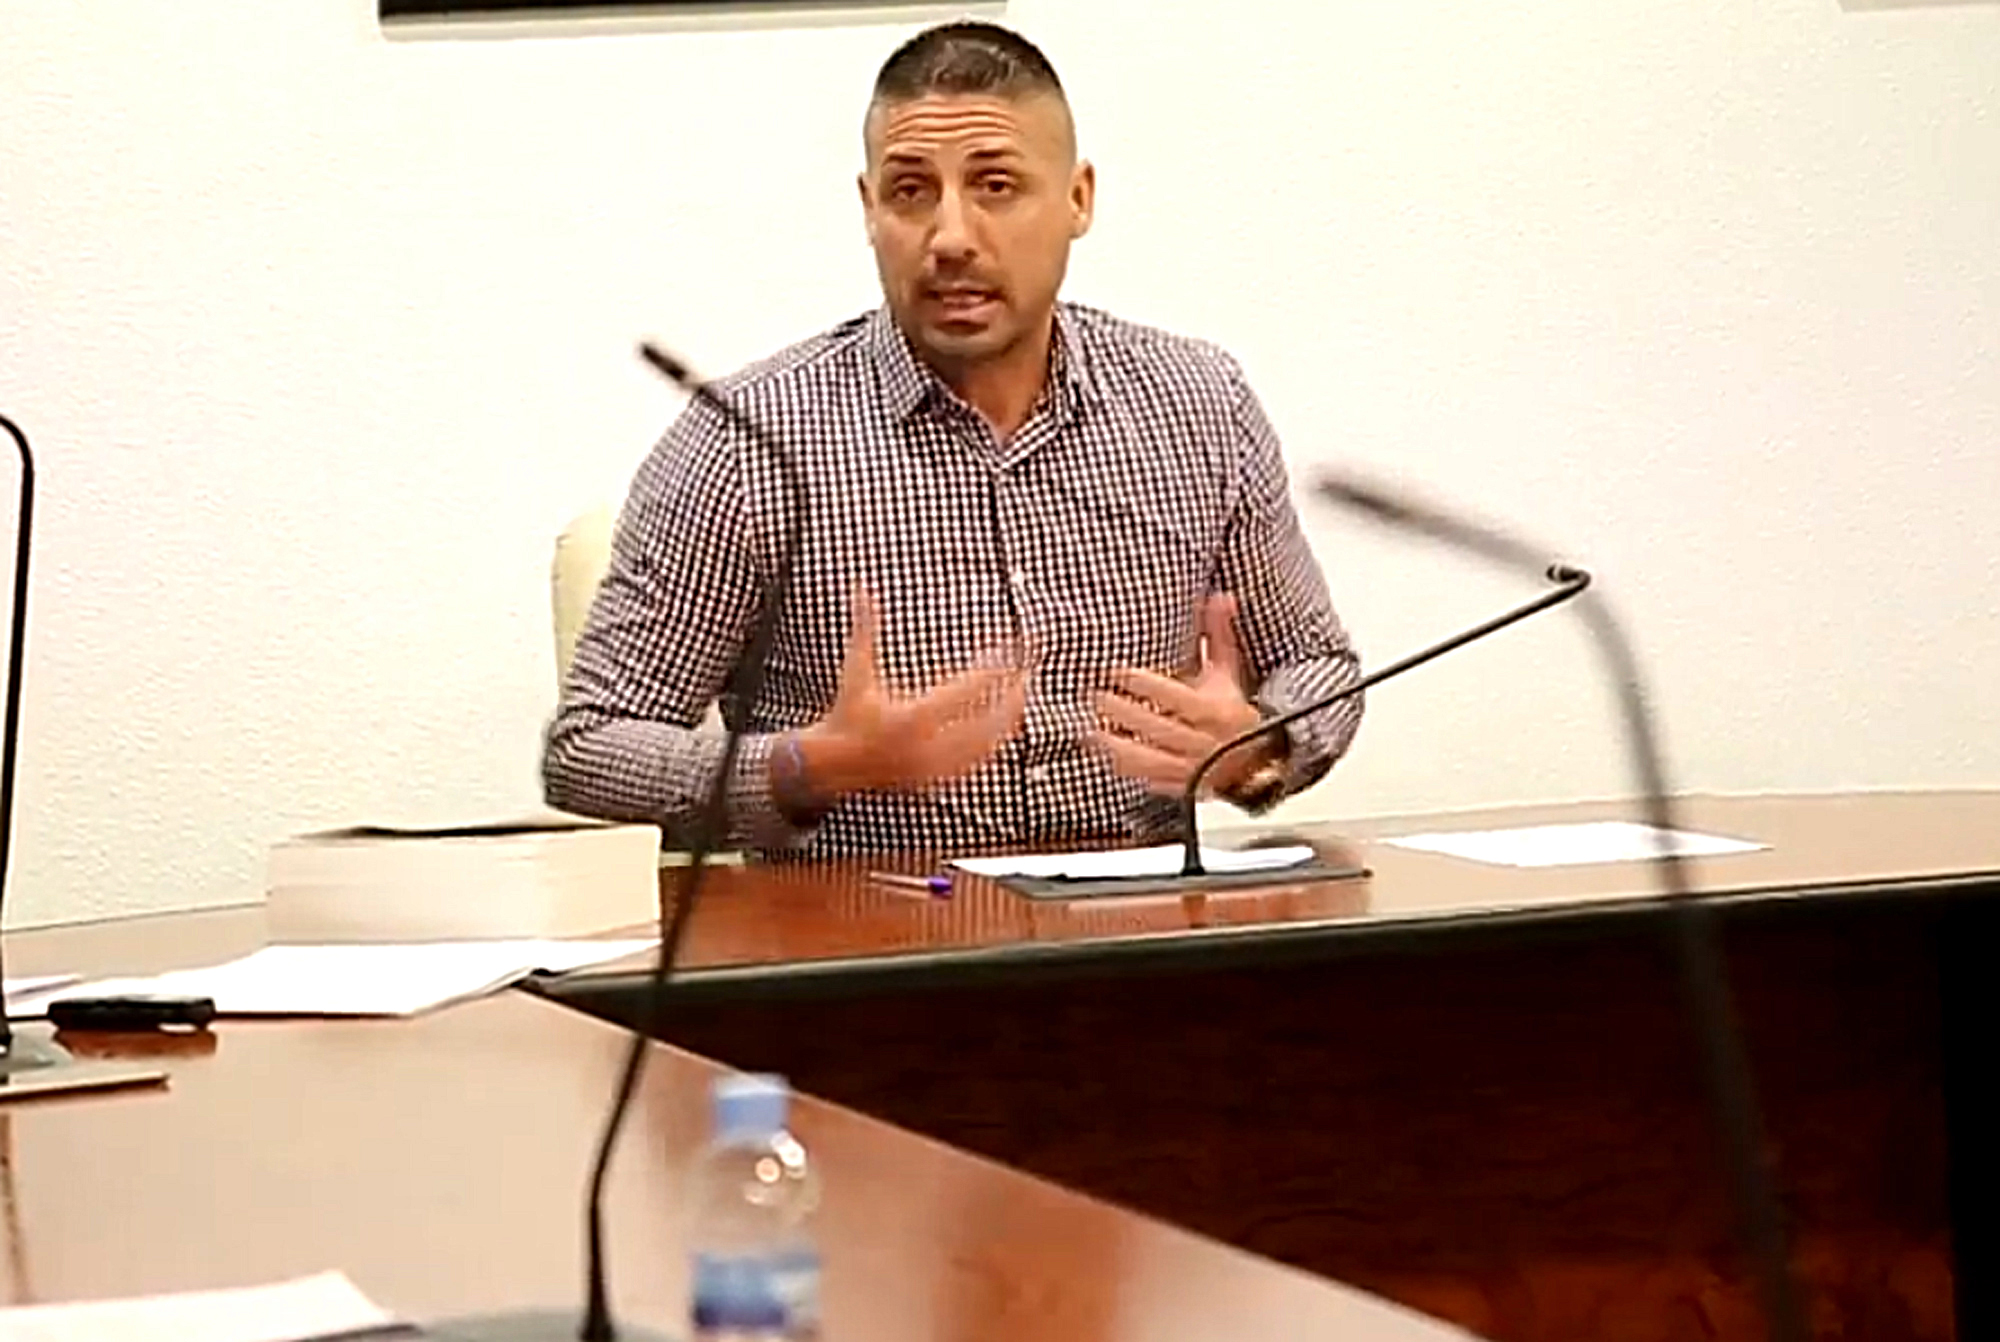 Manuel Gomez frontrunner to become new San Fulgencio Mayor